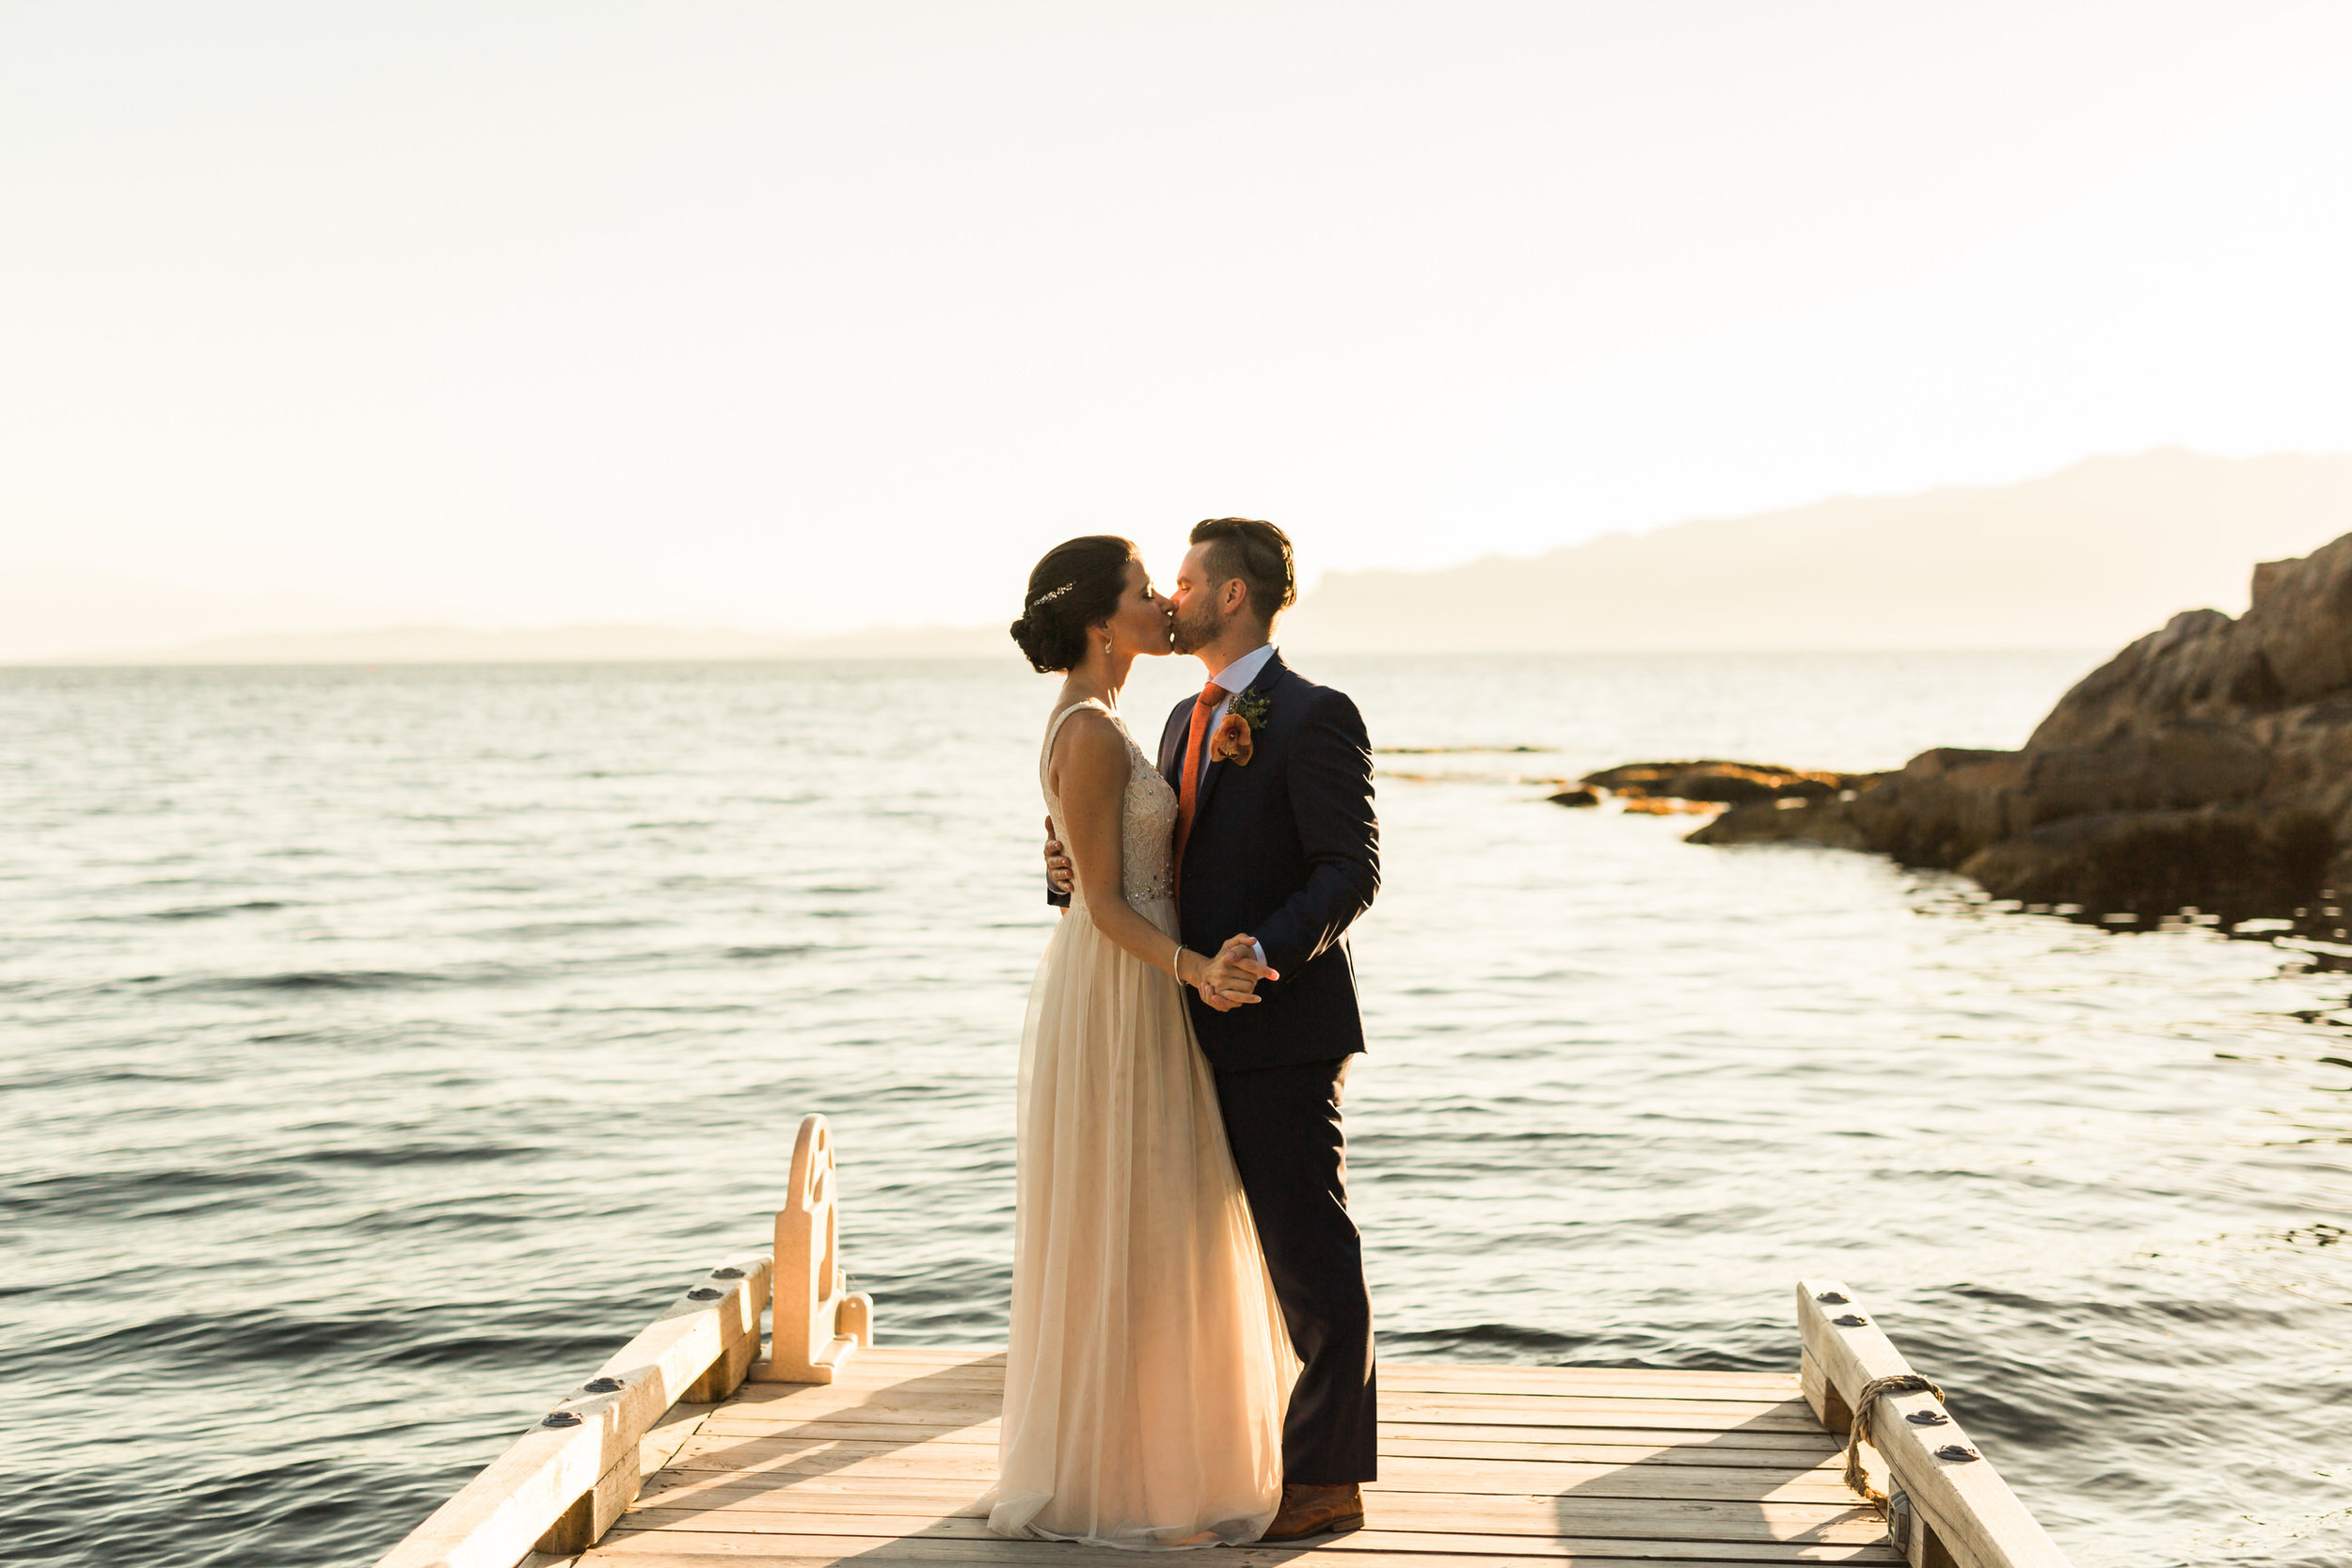 Rockwater Secret Cove Resort Wedding - Sunshine Coast BC Wedding Photographer - Vancouver Wedding Photographer - Sunshine Coast Elopement Photos - IMG_1352.jpg